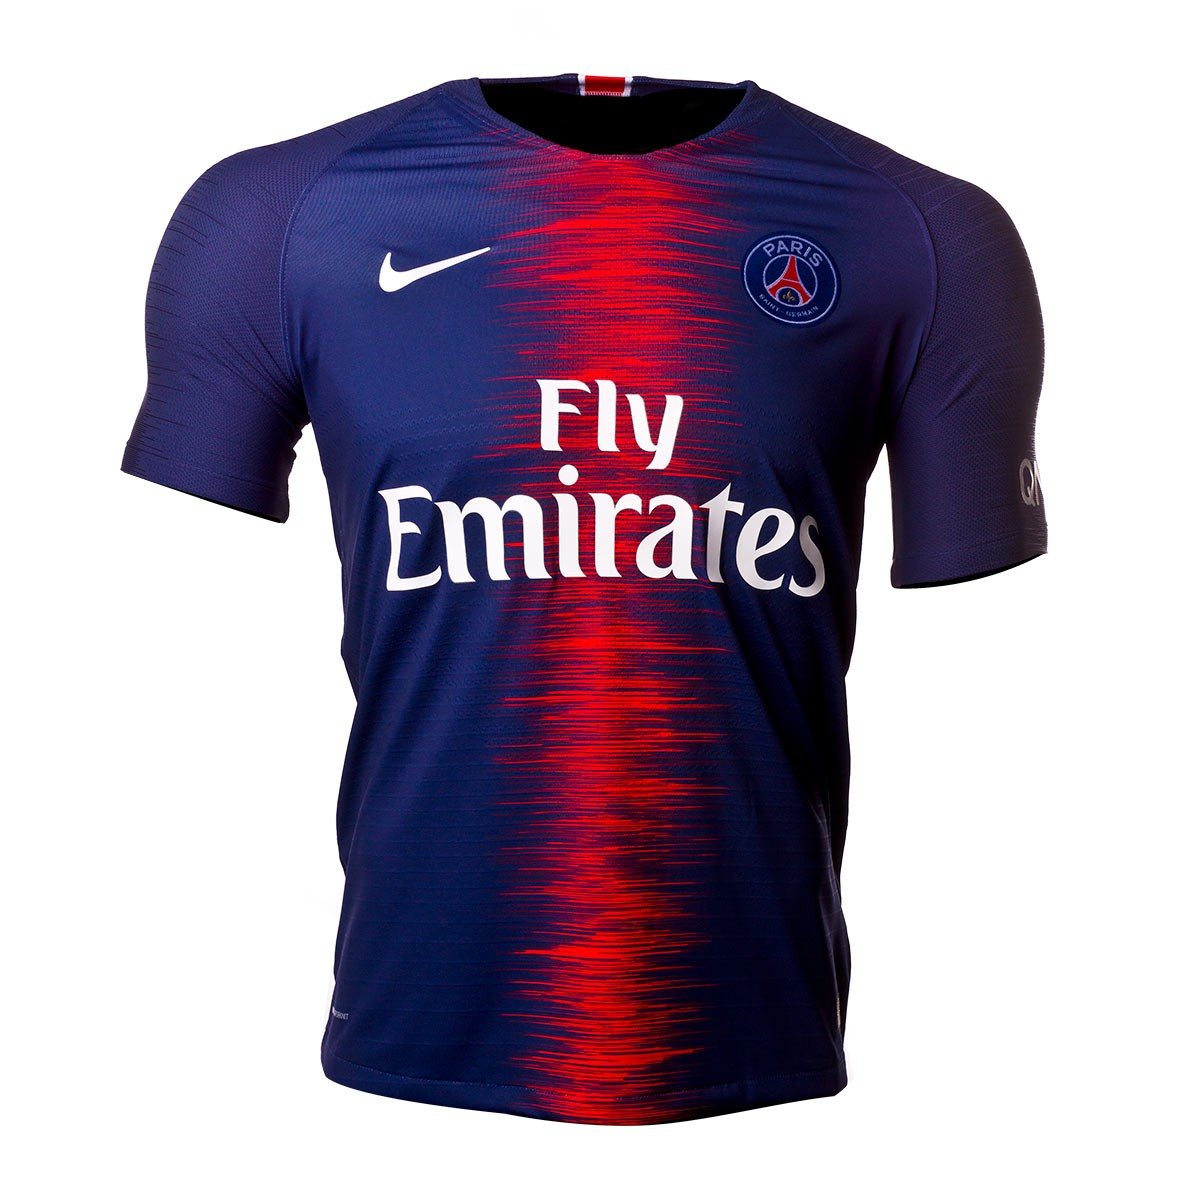 2178250da9 Maillot Nike Paris Saint-Germain Vapor Domicile 2018-2019 Midnight  navy-White - Boutique de football Fútbol Emotion